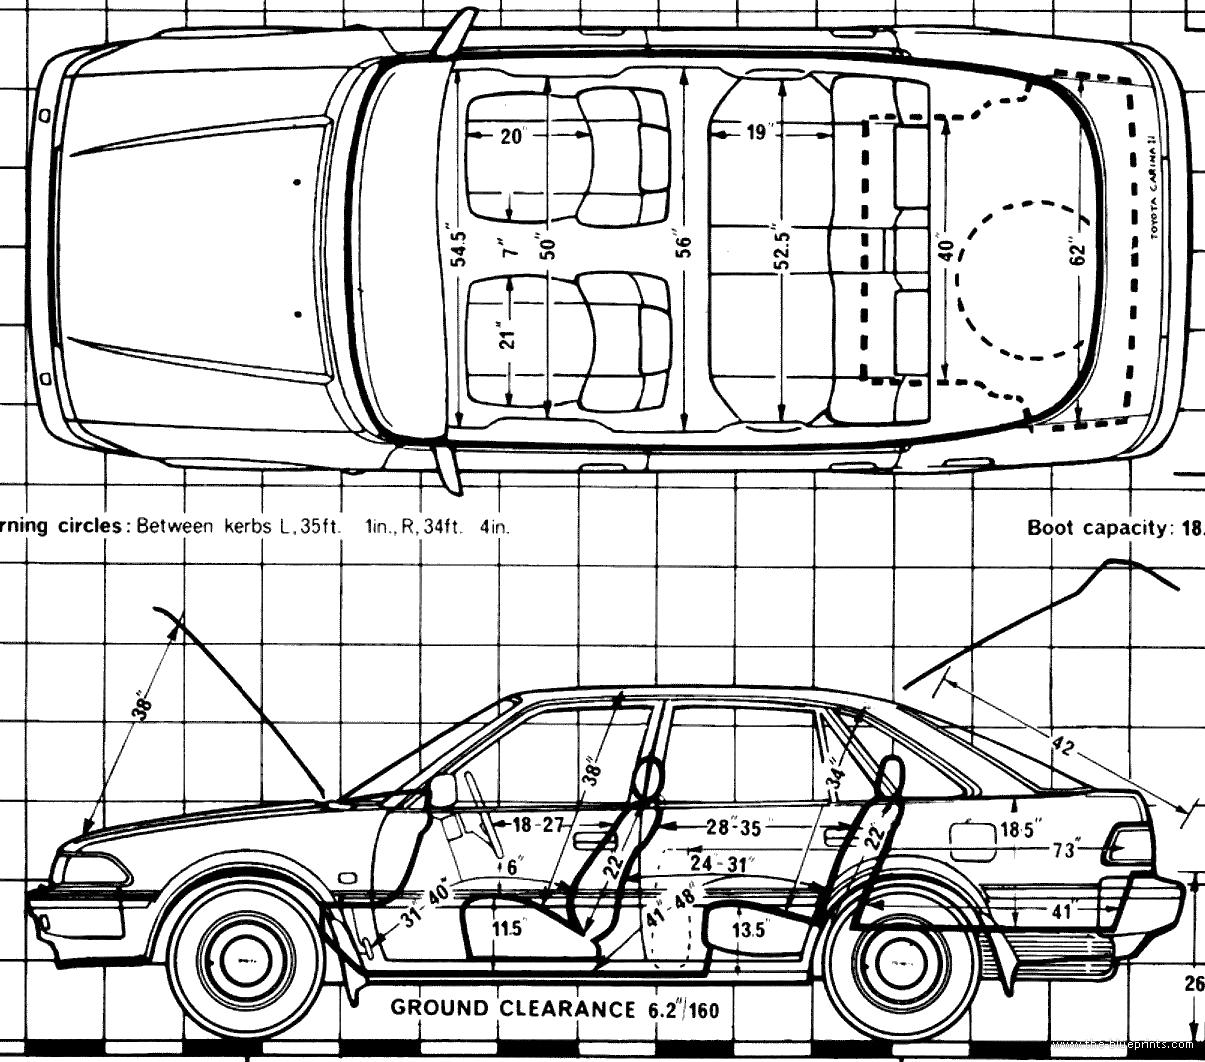 Blueprints Gt Cars Gt Toyota Gt Toyota Carina Ii 1 6 Gl